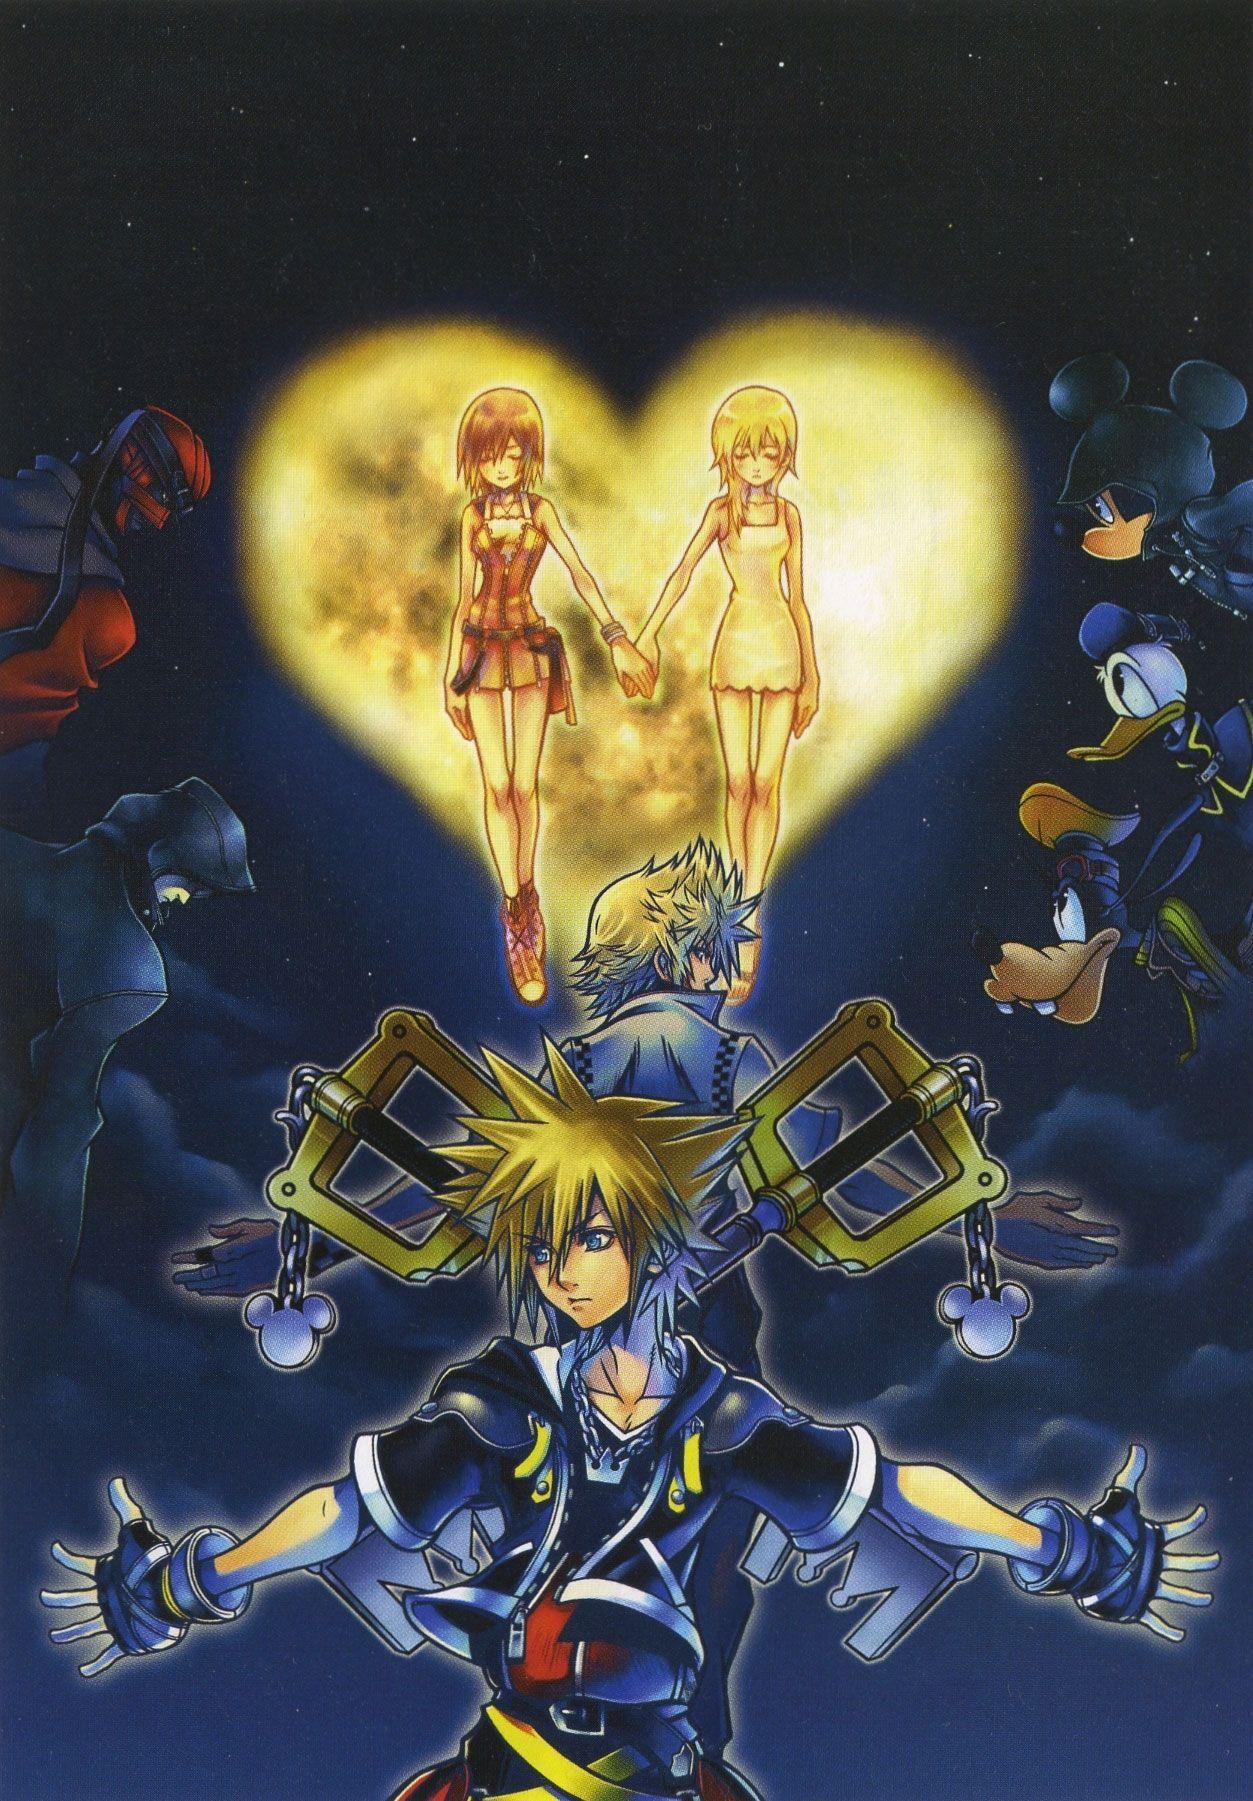 Kingdom Hearts 2 Wallpapers Wallpaper Kingdom Hearts 2 Kingdom Hearts Wallpaper Kingdom Hearts Fanart Sora Kingdom Hearts